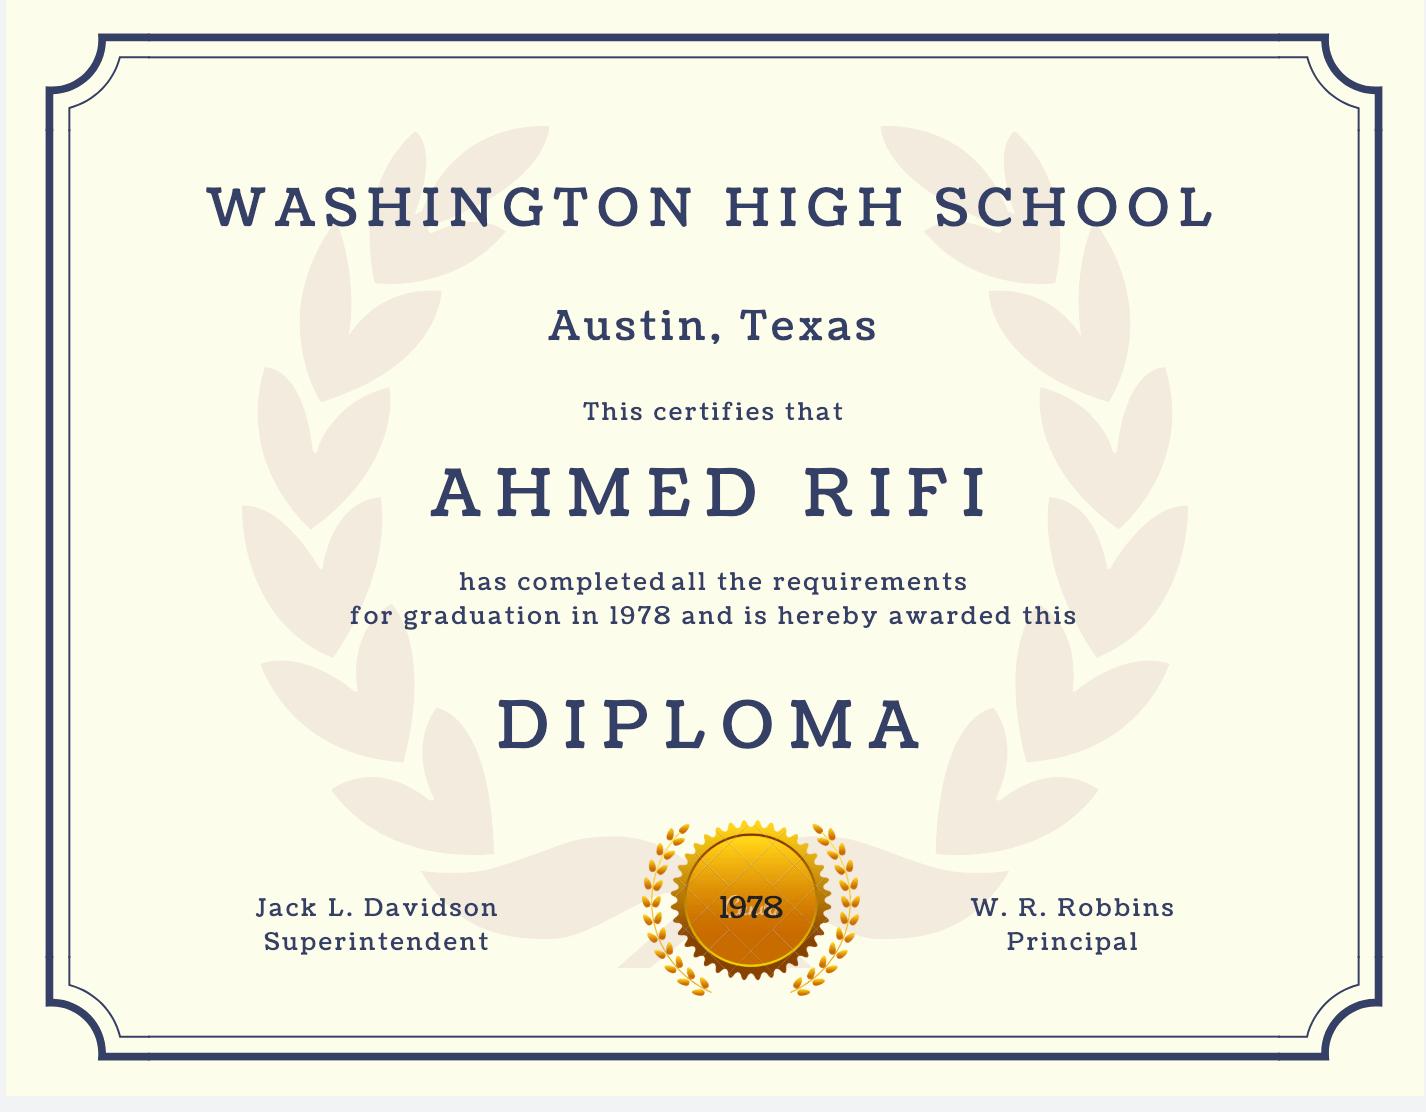 High School Certificate Template Beautiful 60 Free High School Diploma Template Printable